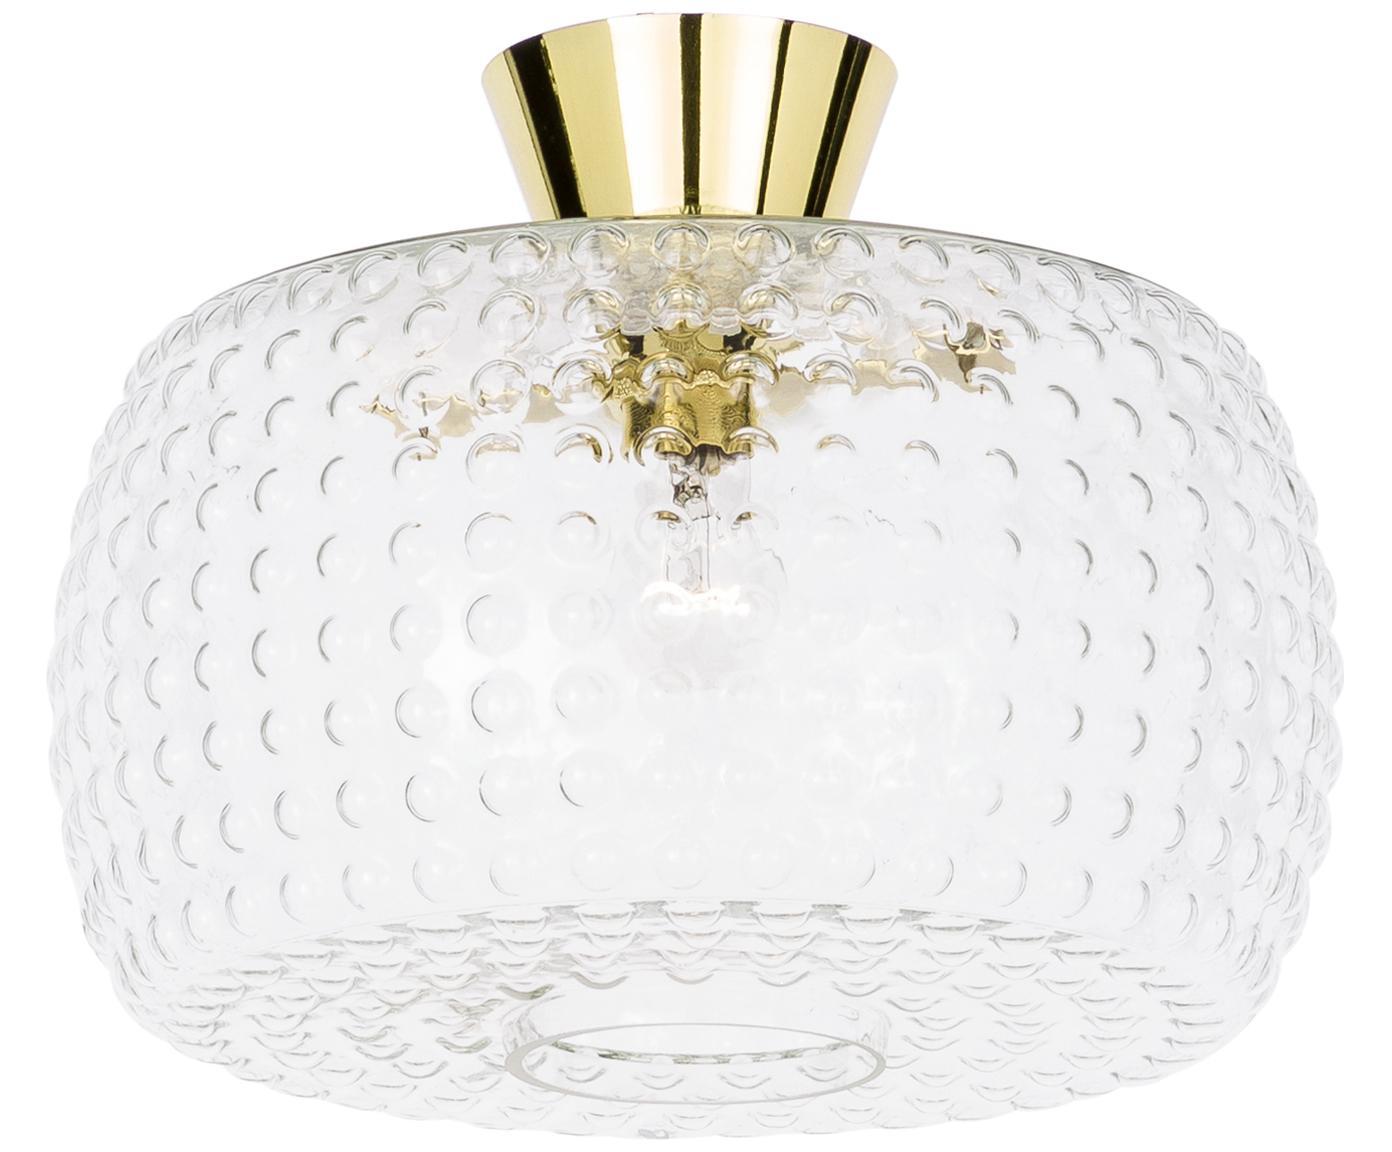 Plafondlamp Spring van glas, Baldakijn: gelakt messing, Lampenkap: glas, Goudkleurig, transparant, Ø 40 x H 27 cm